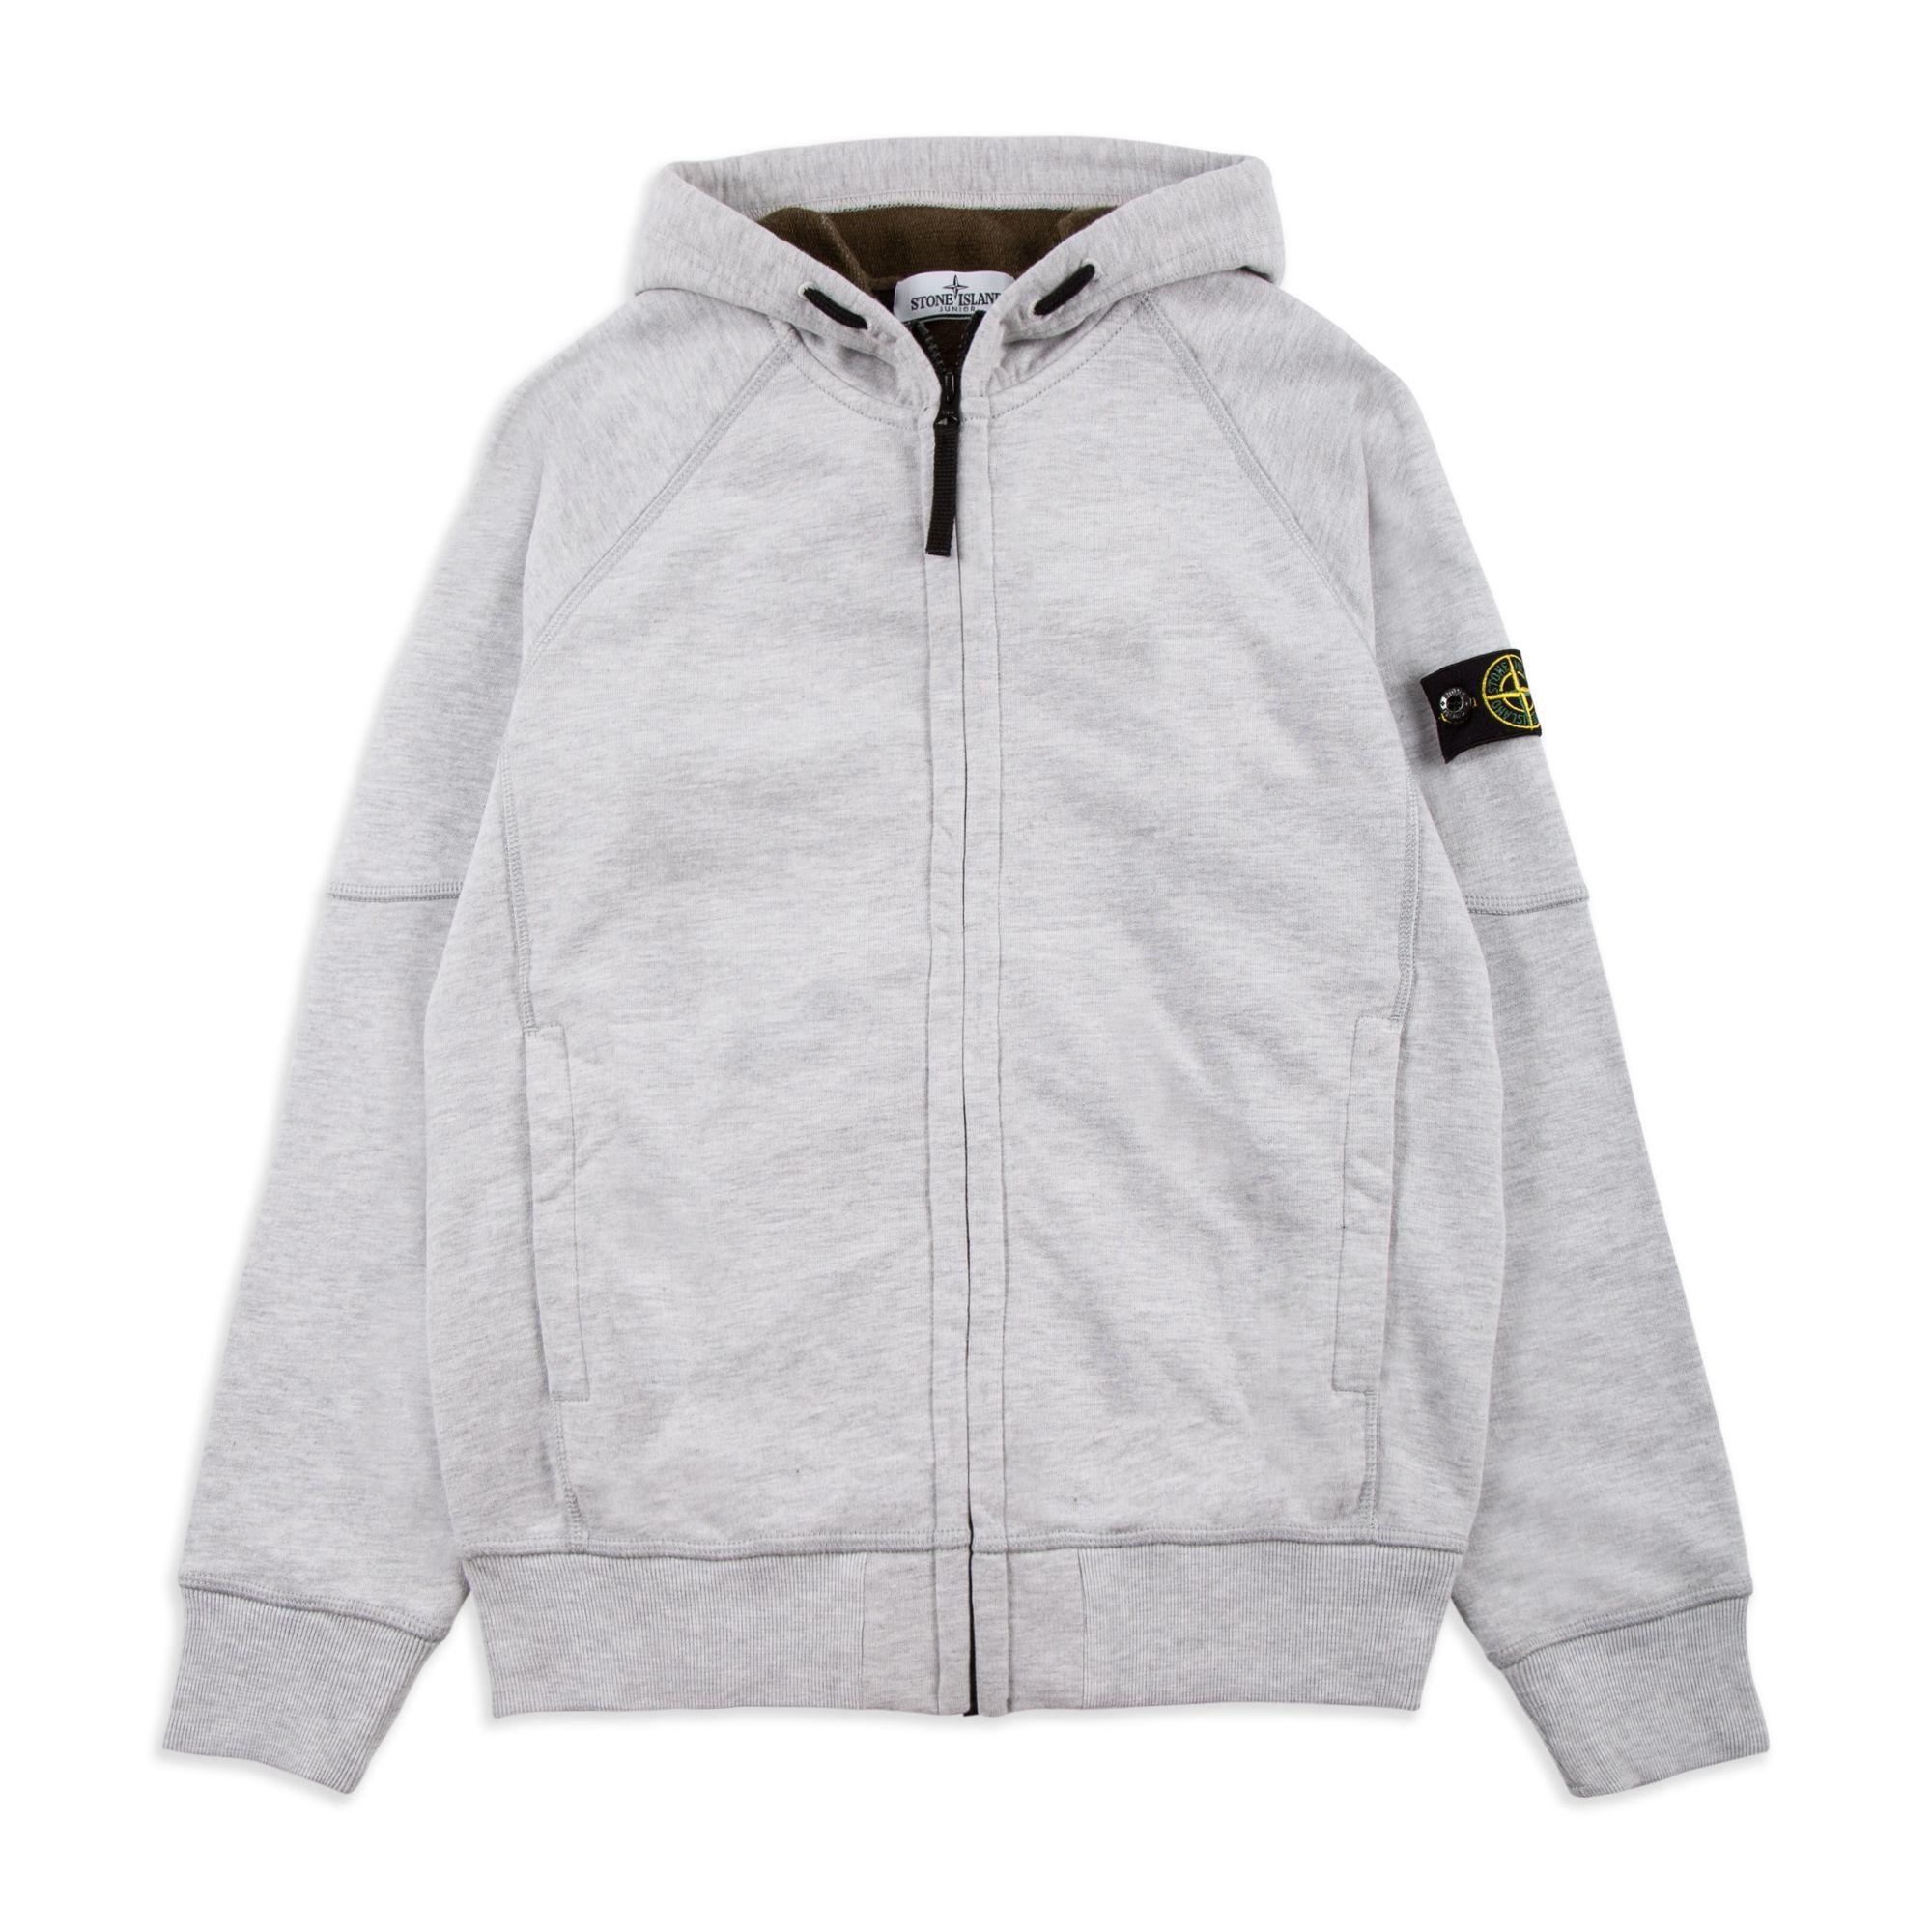 b73b39171793 STONE ISLAND JUNIOR Boys Compass Hoodie - Grey Boys hooded sweatshirt •  Soft cotton jersey • Full zip fastening • Ribbed cuffs and hem • Zipped  front ...